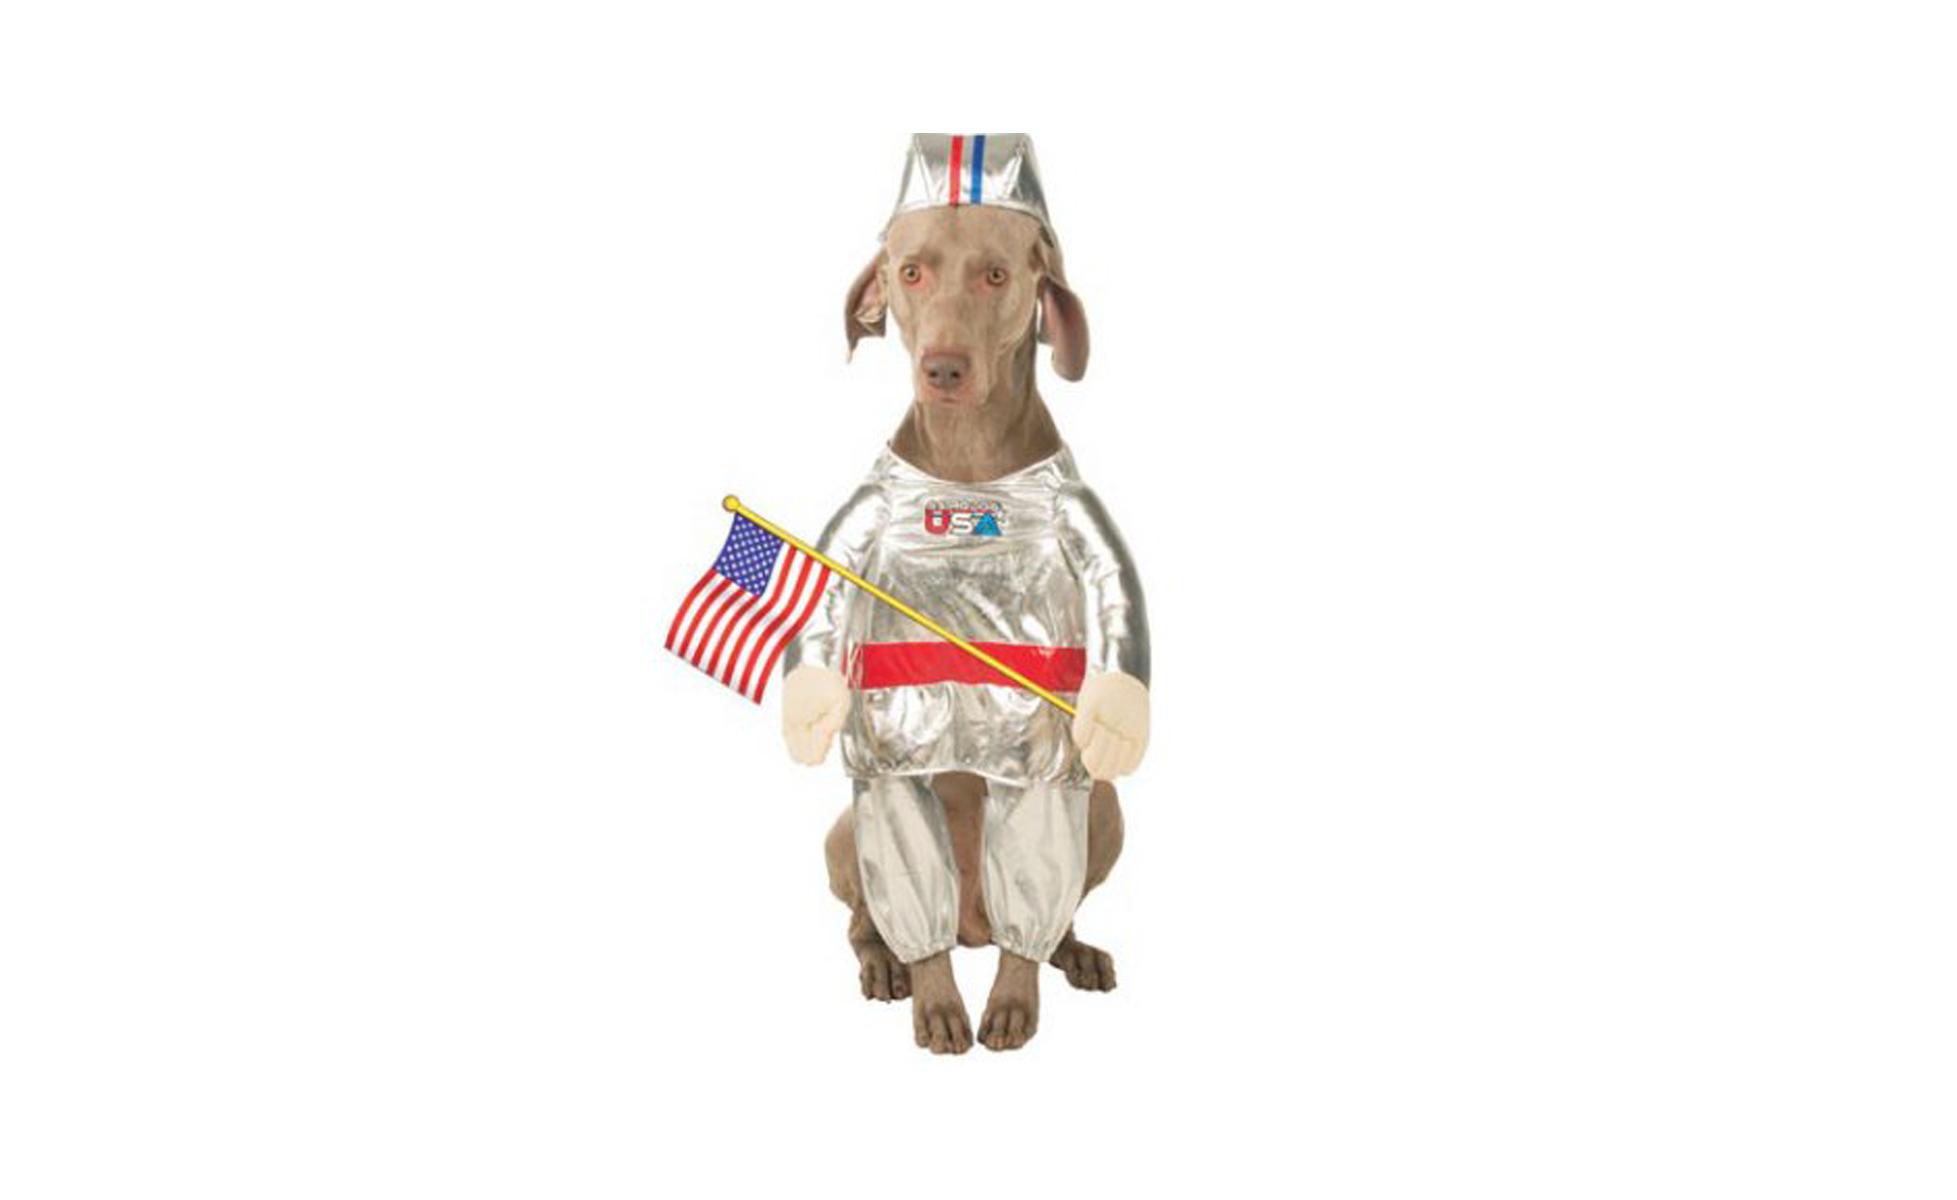 Astronaut Dog Costume at Jet.com